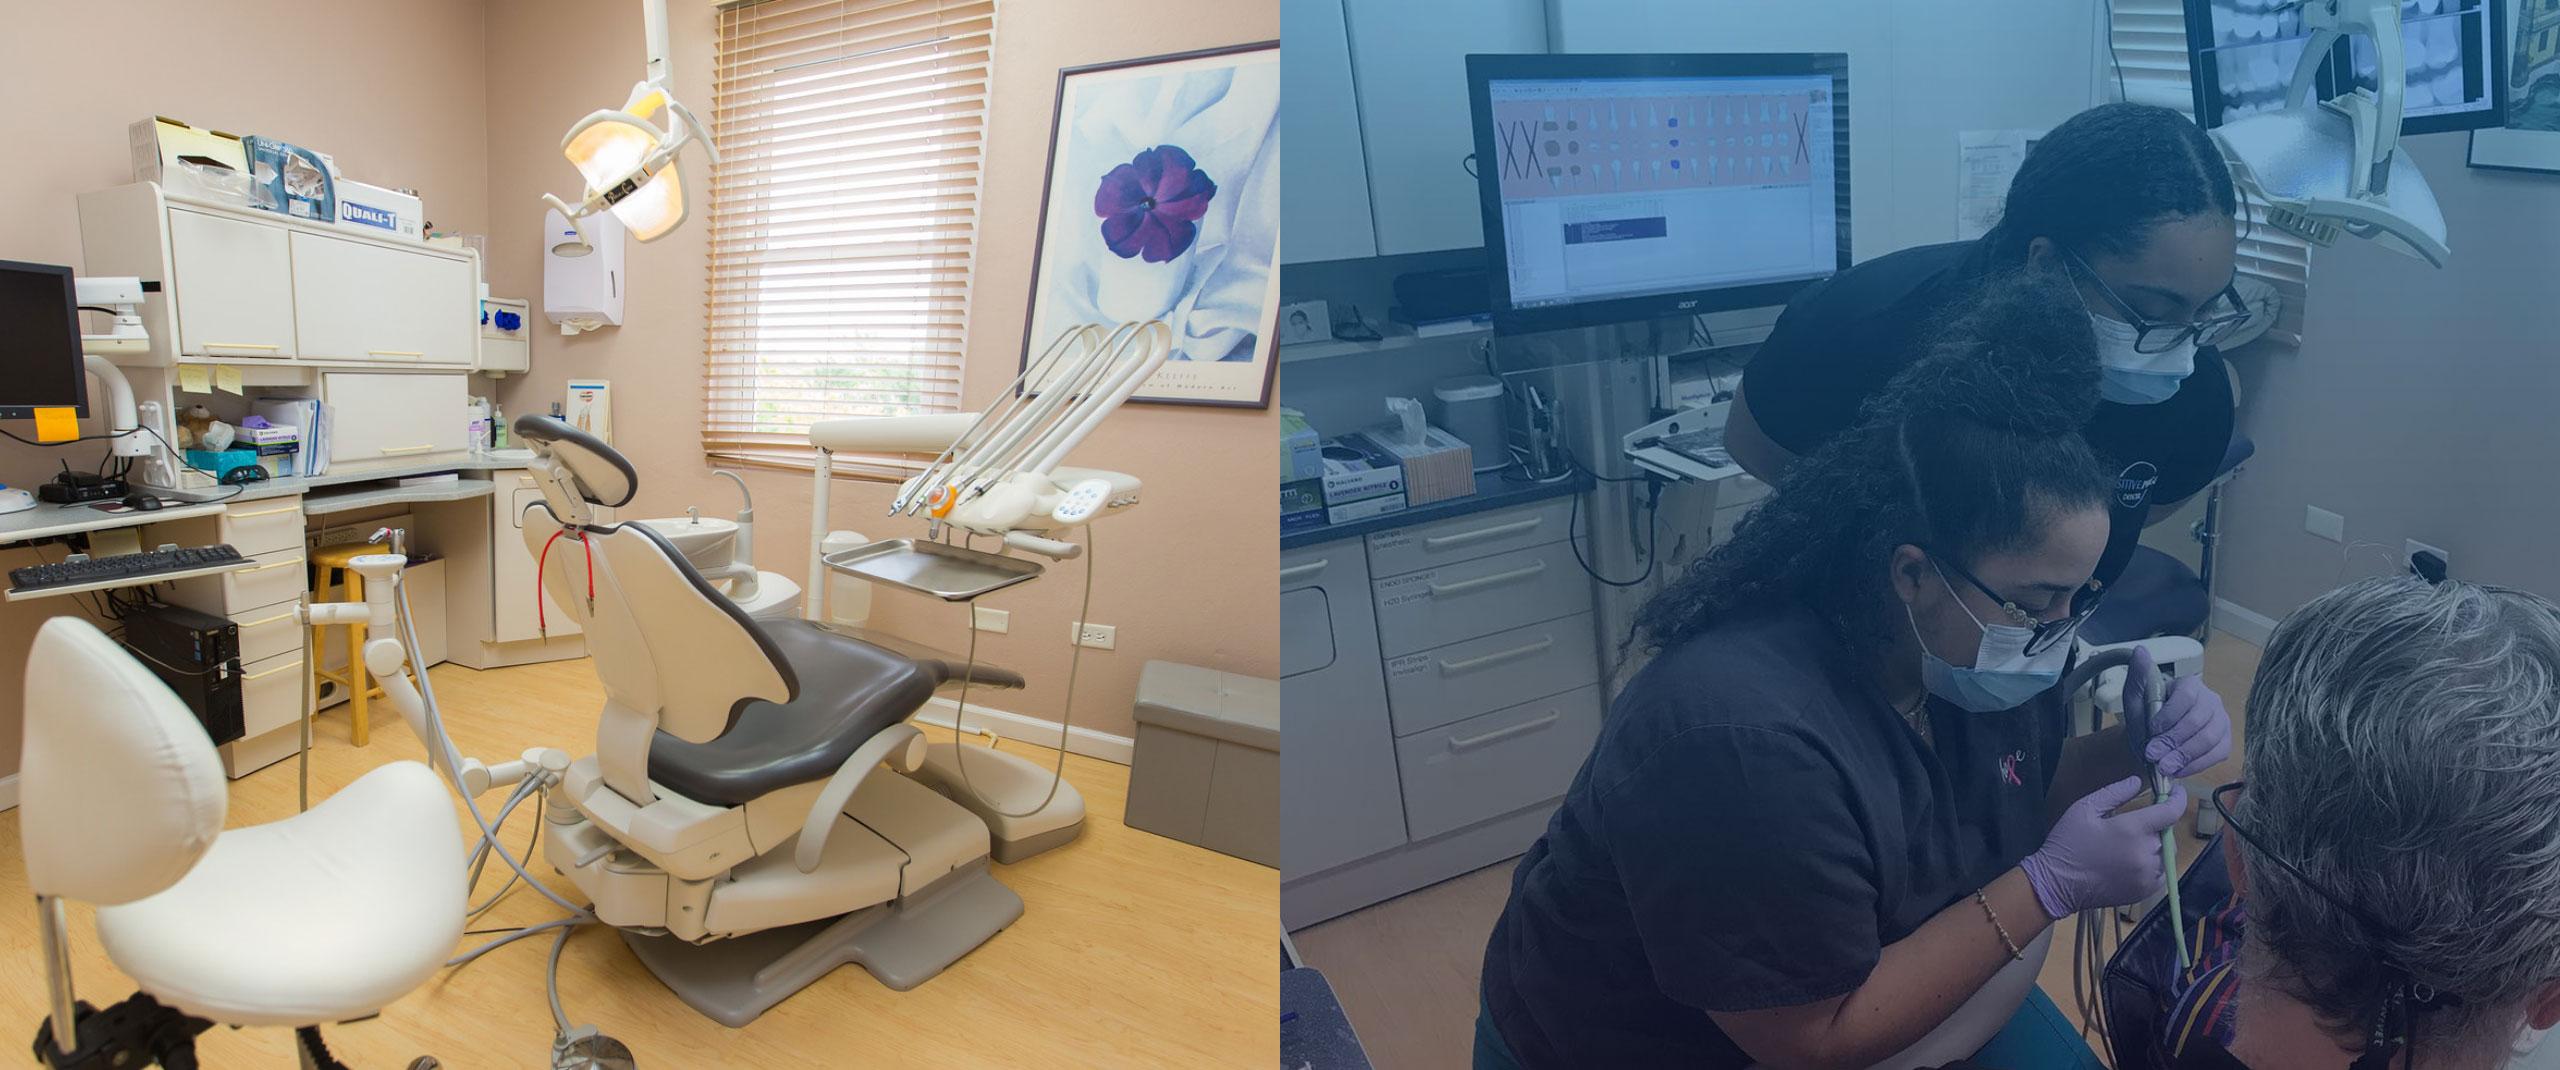 Positive Image Dental Office